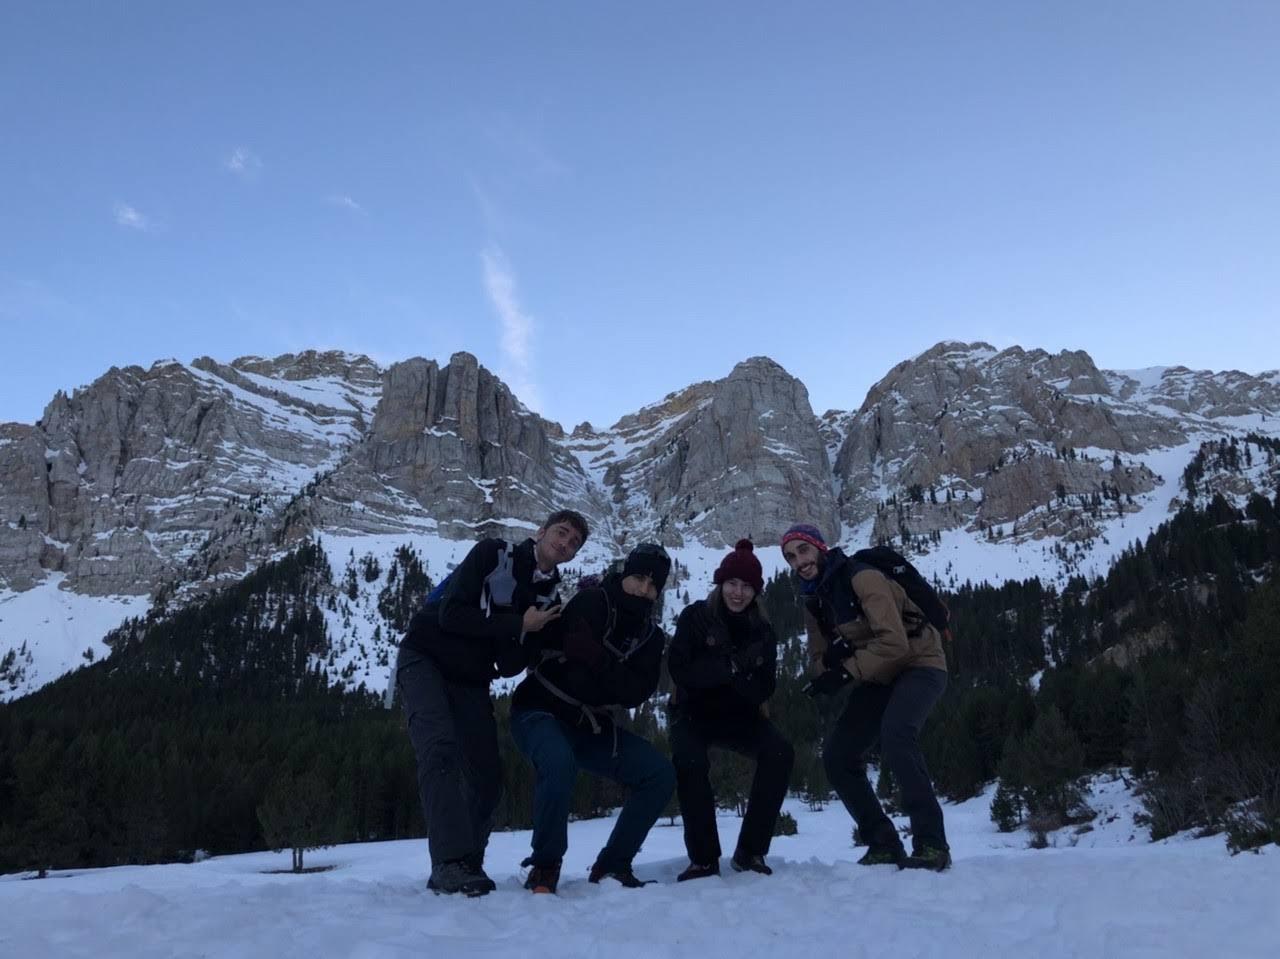 Grup de Joves volta per Prat de Cadí 9 de desembre 2018